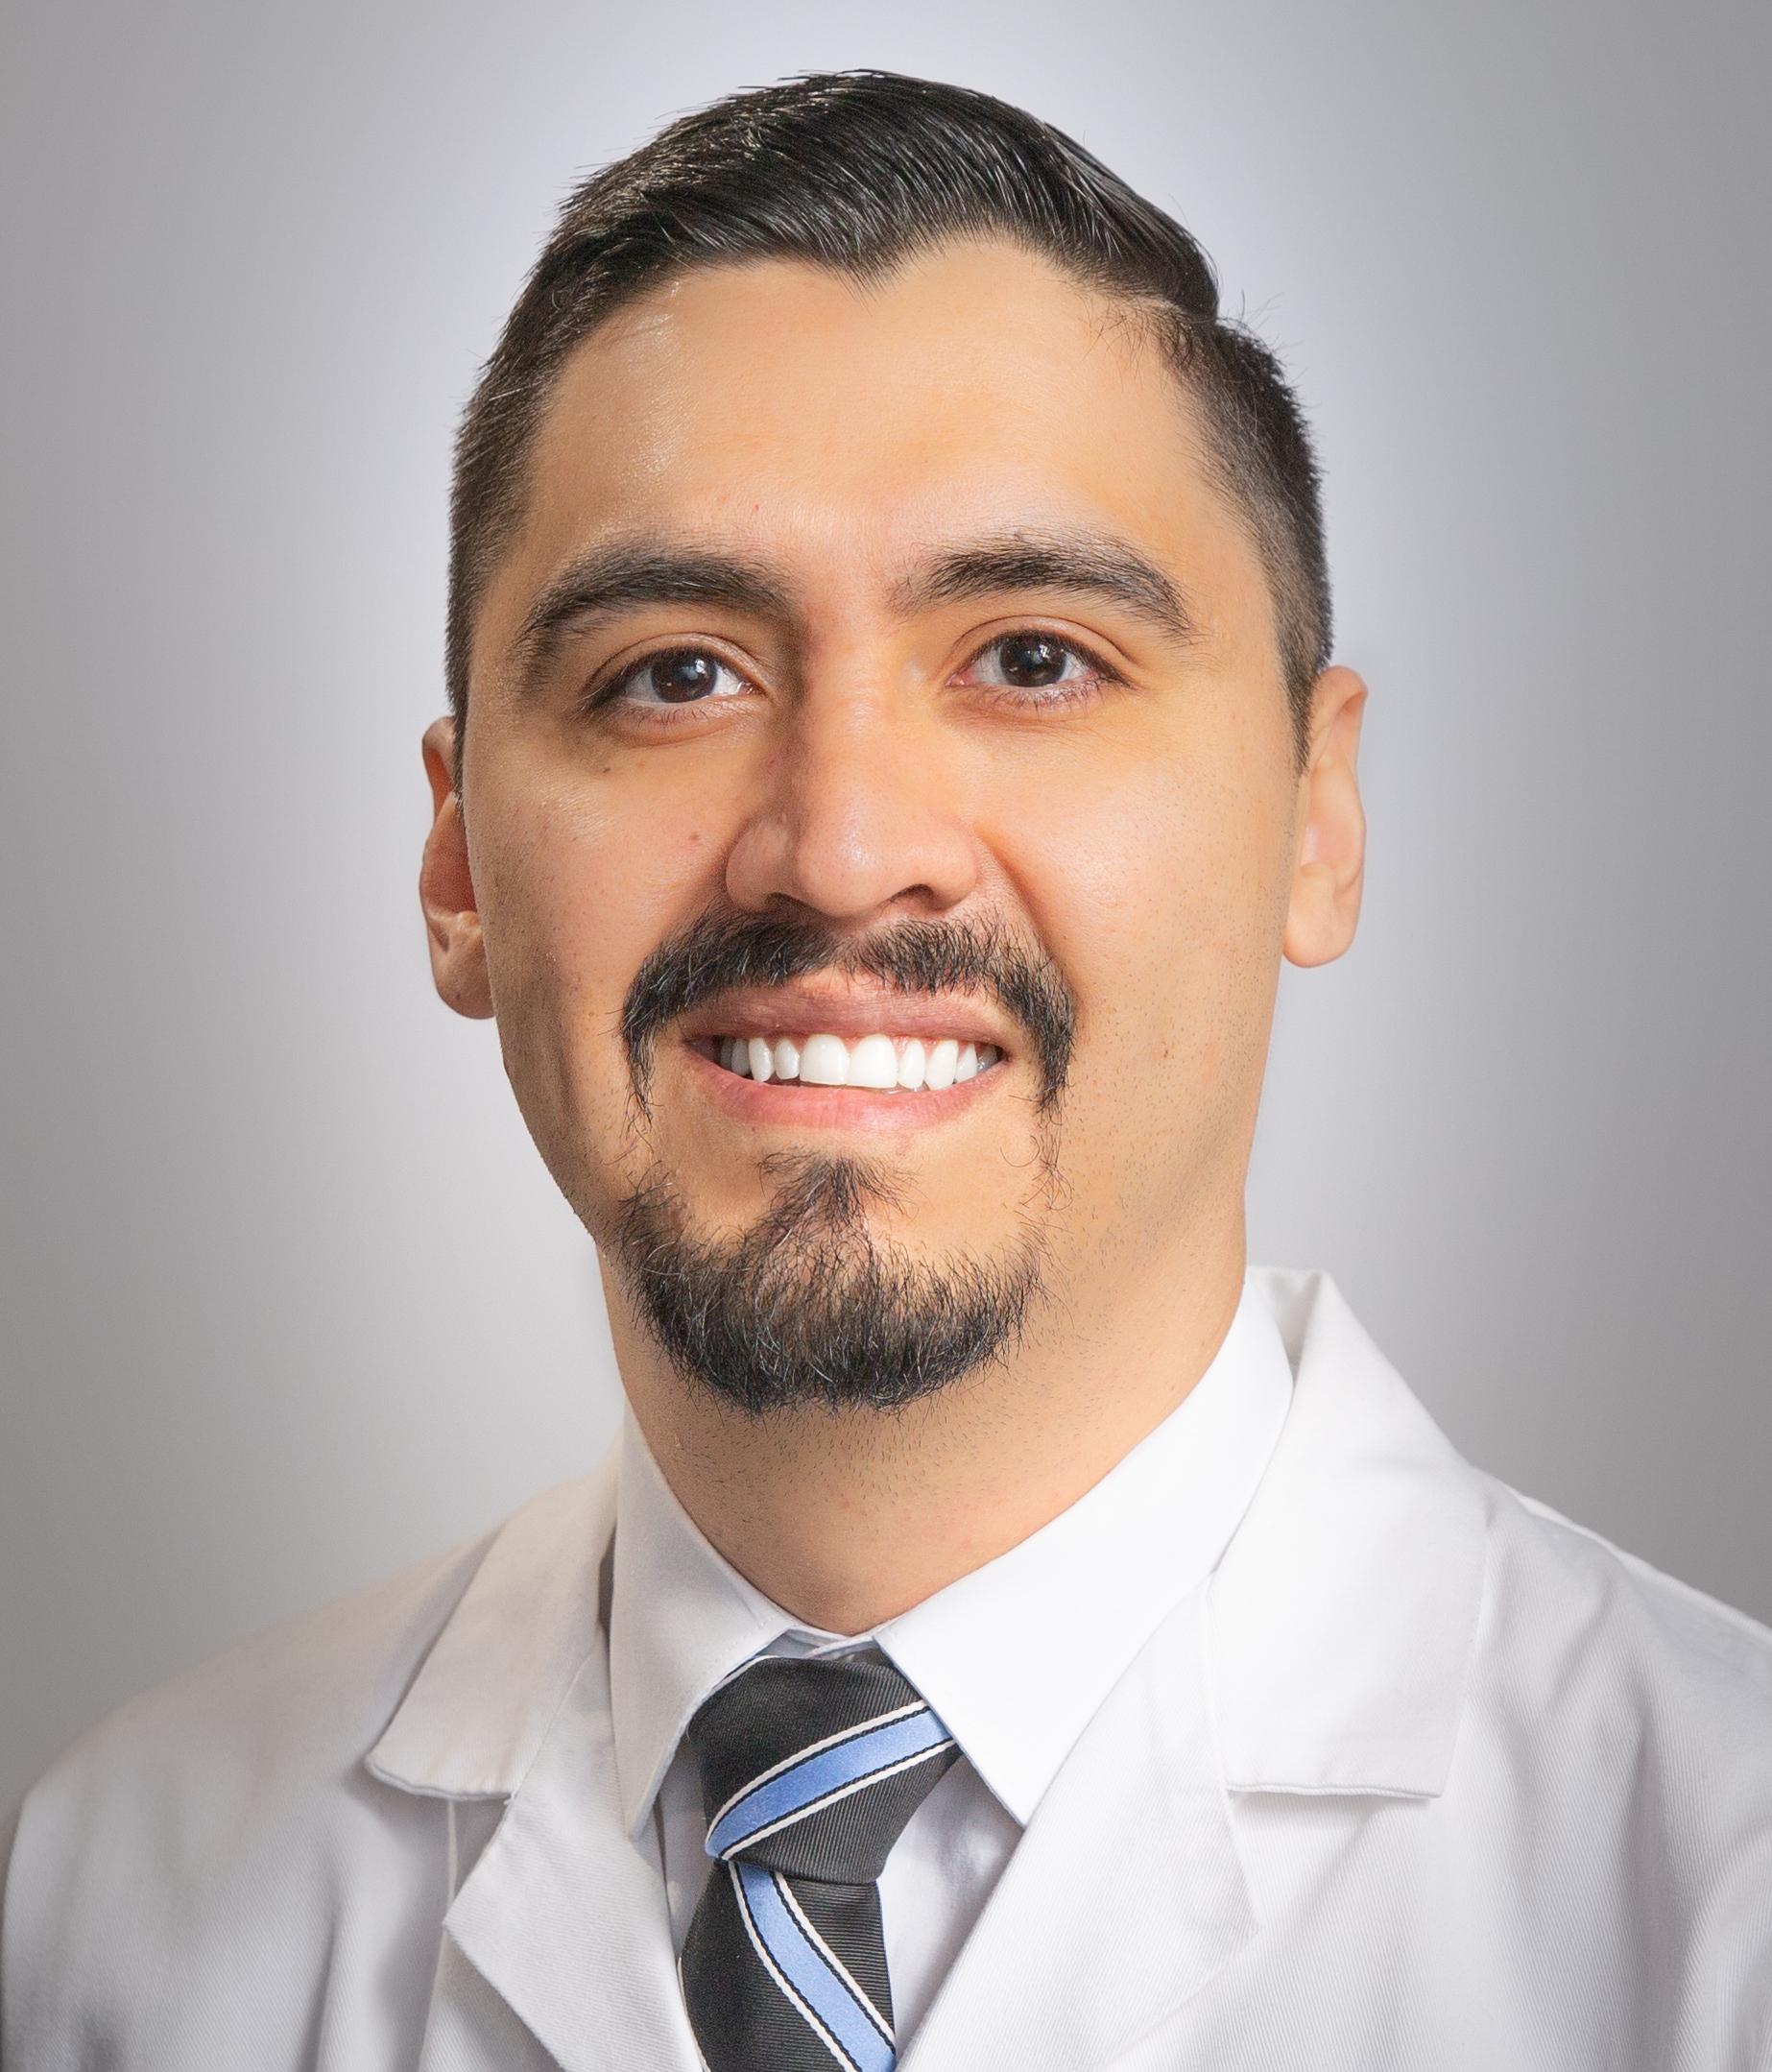 Dr. Alfonso Belmonte